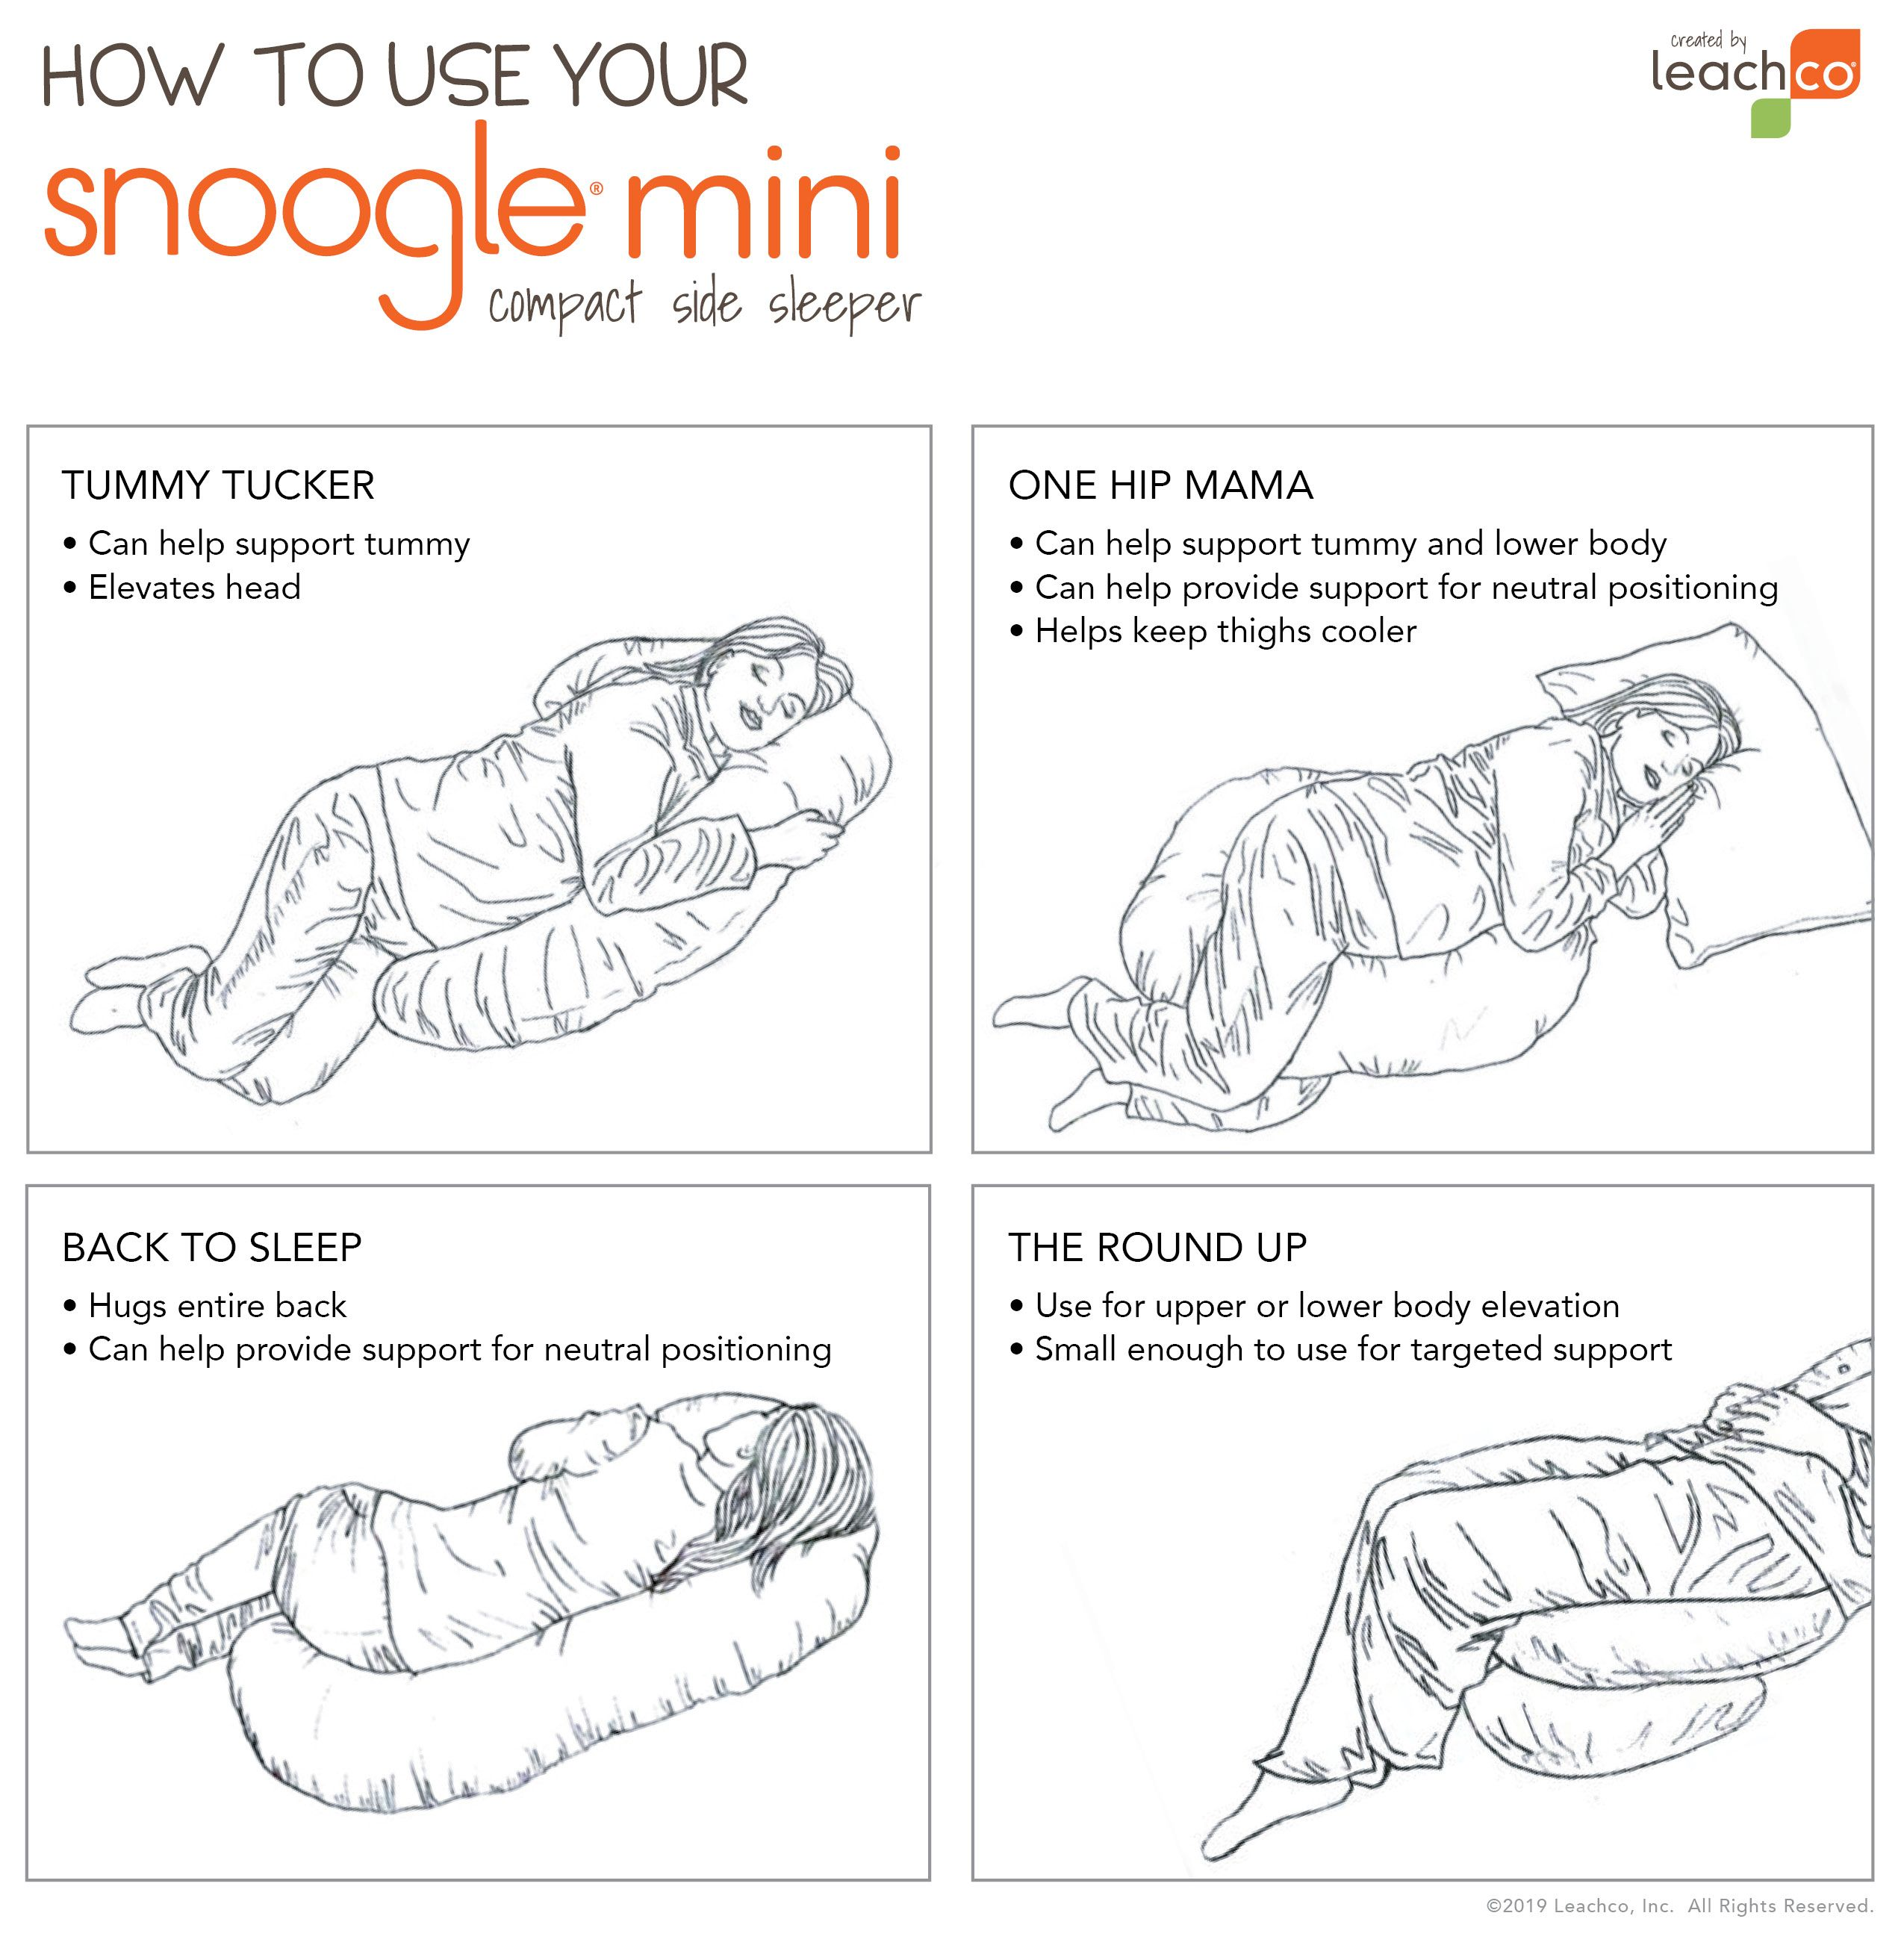 Snoogle Mini Body Pillow Snoogle Mini